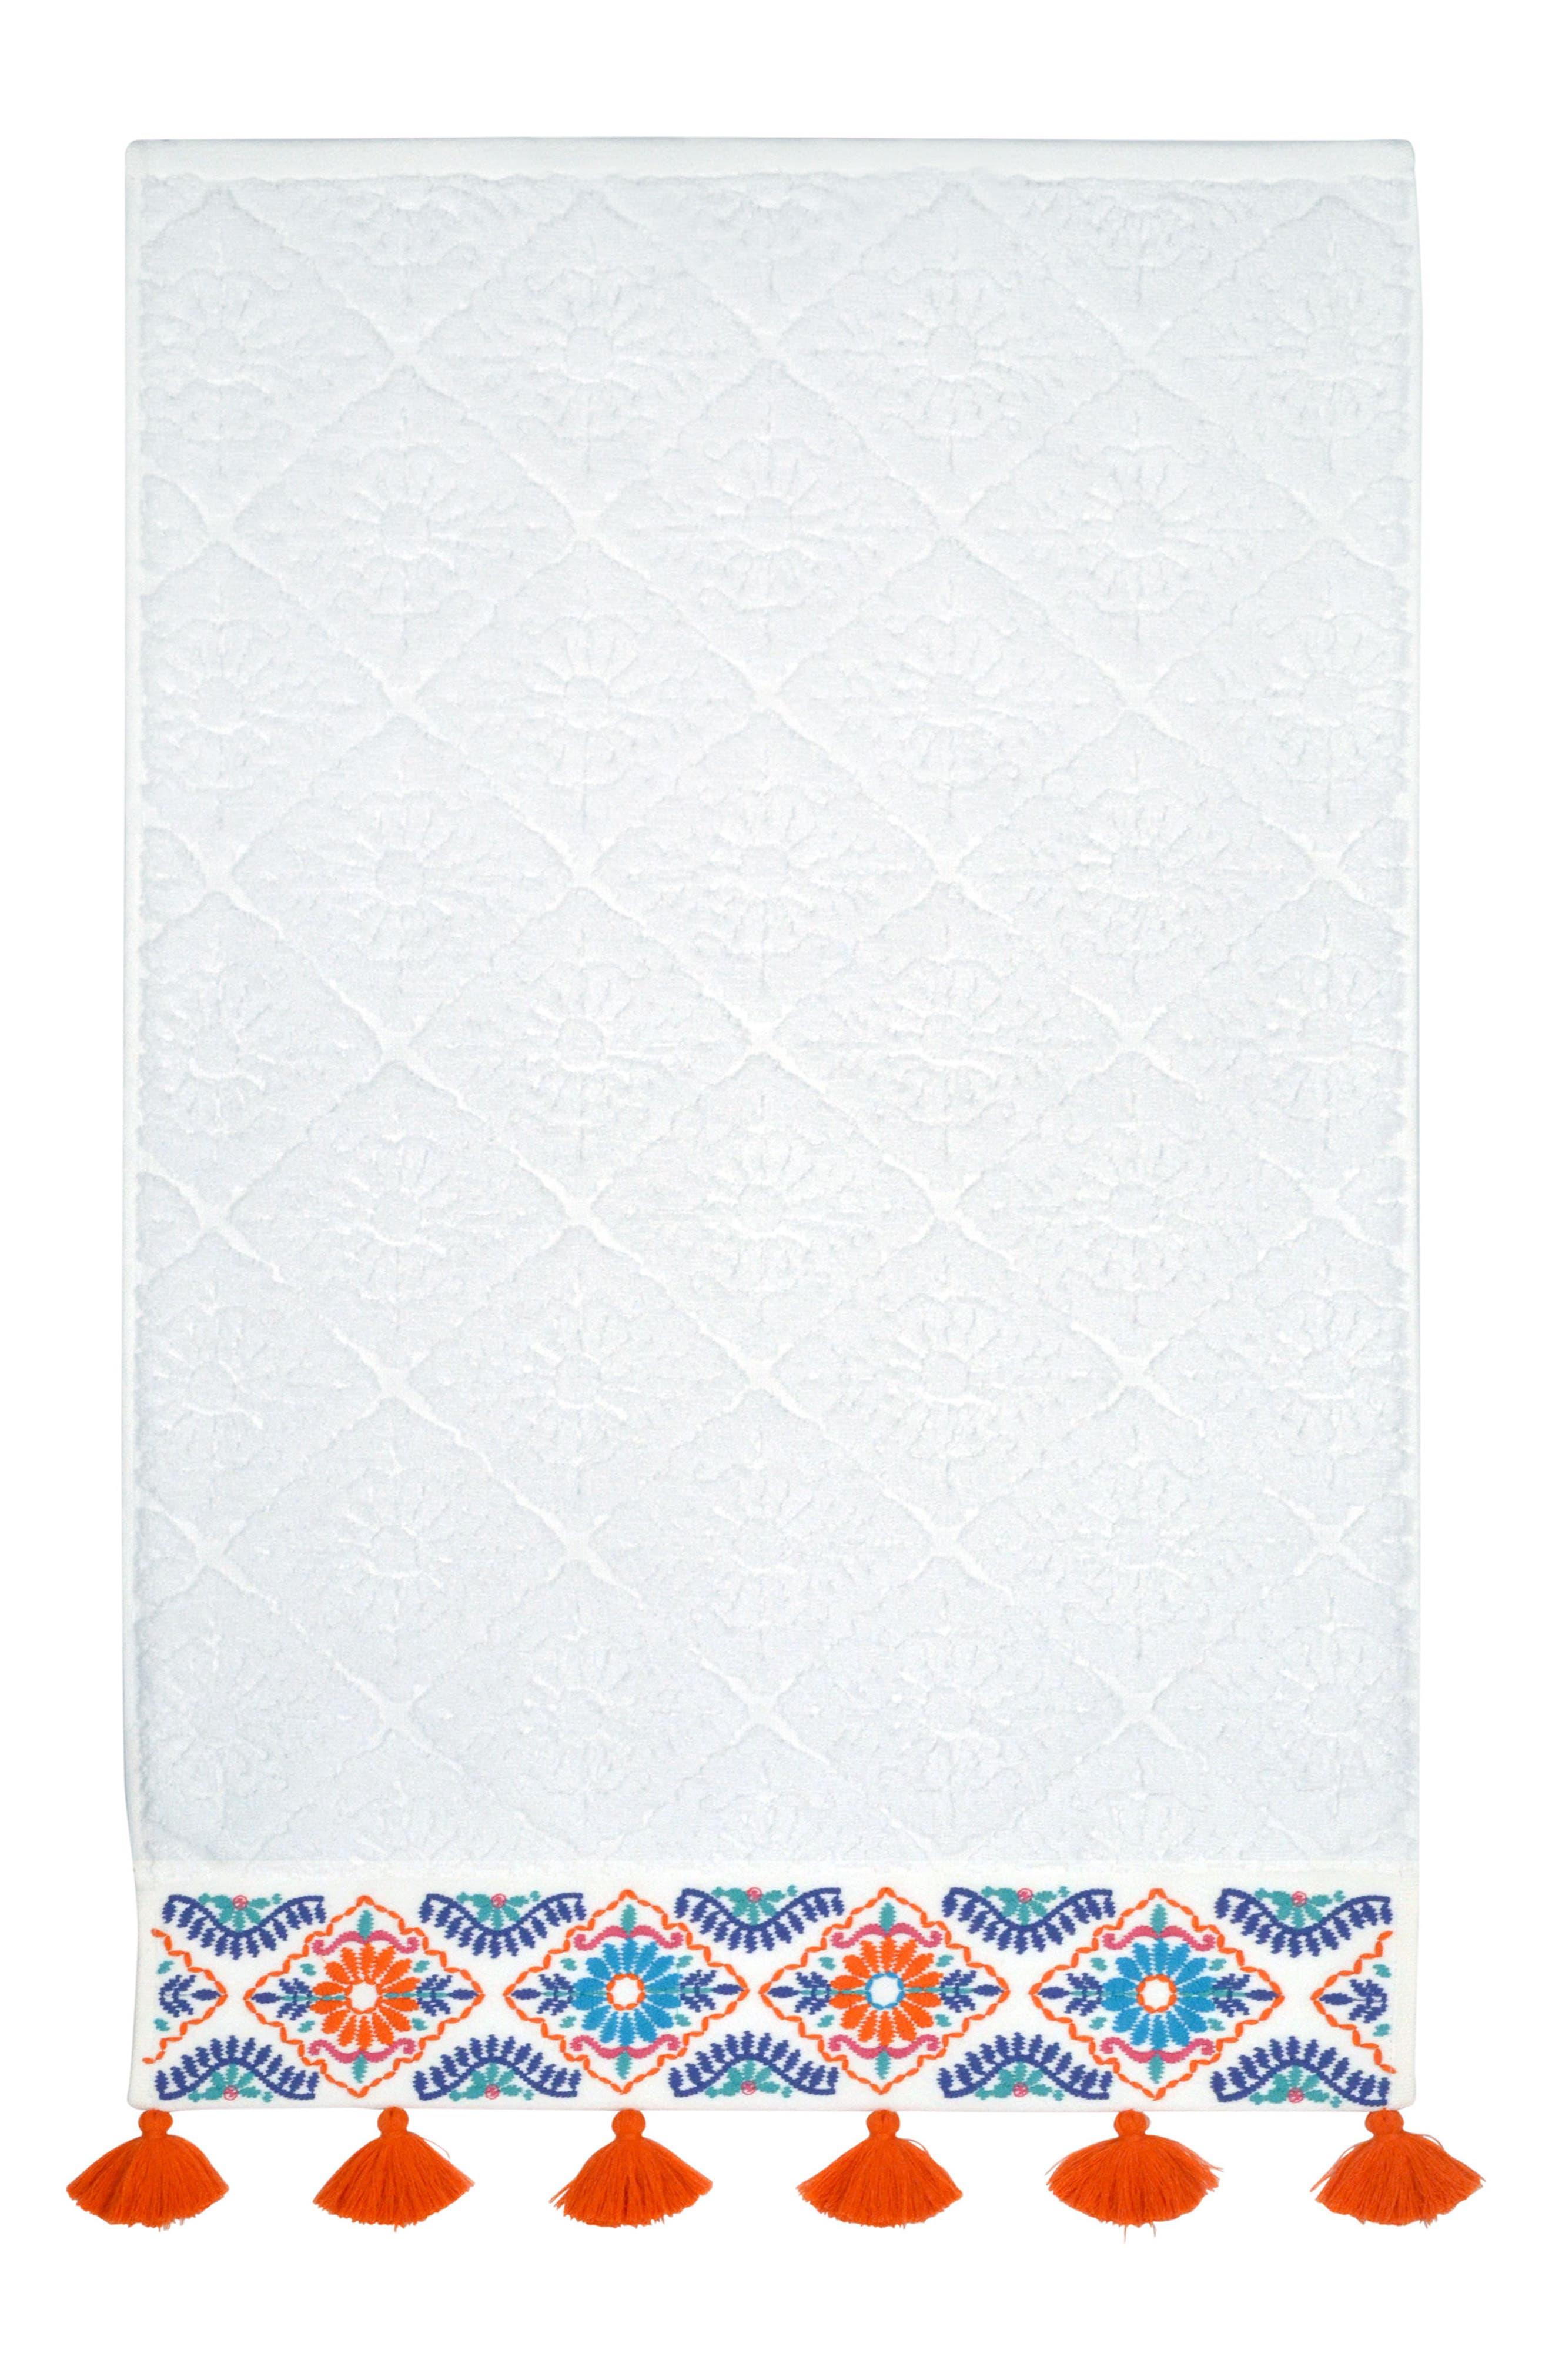 Main Image - John Robshaw Aloka Hand Towel